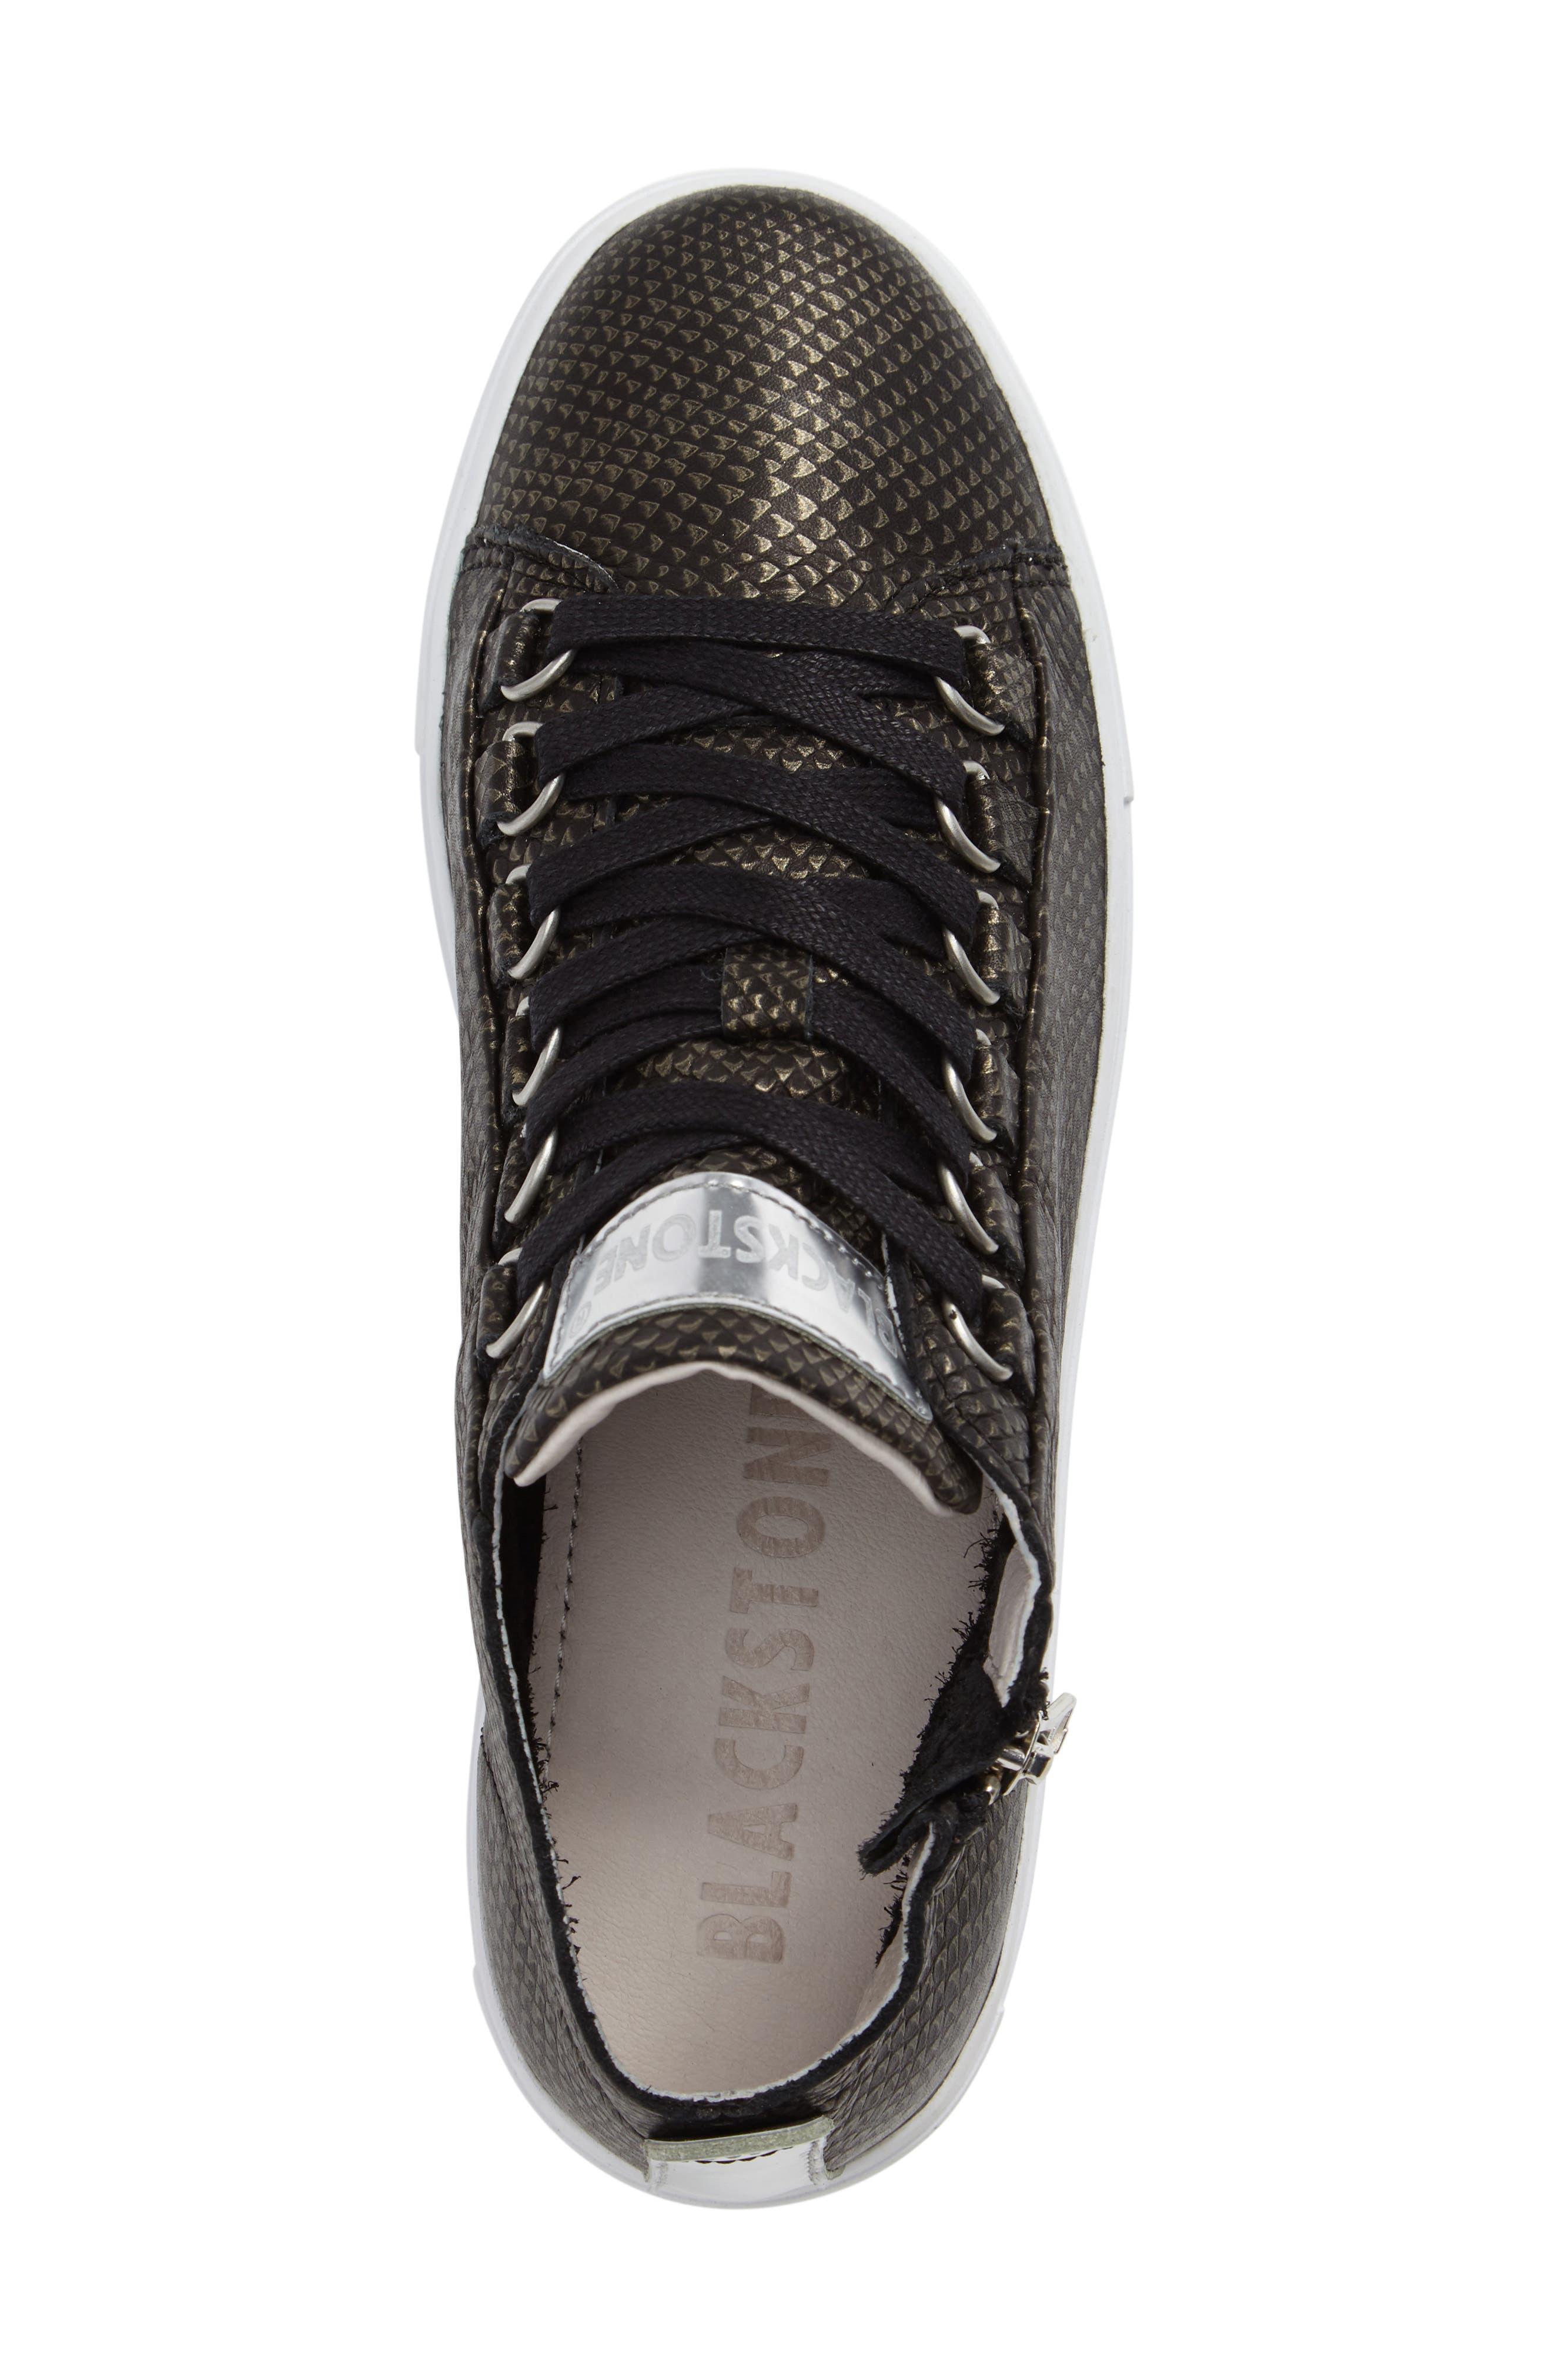 NL28 Midi Sneaker,                             Alternate thumbnail 3, color,                             001